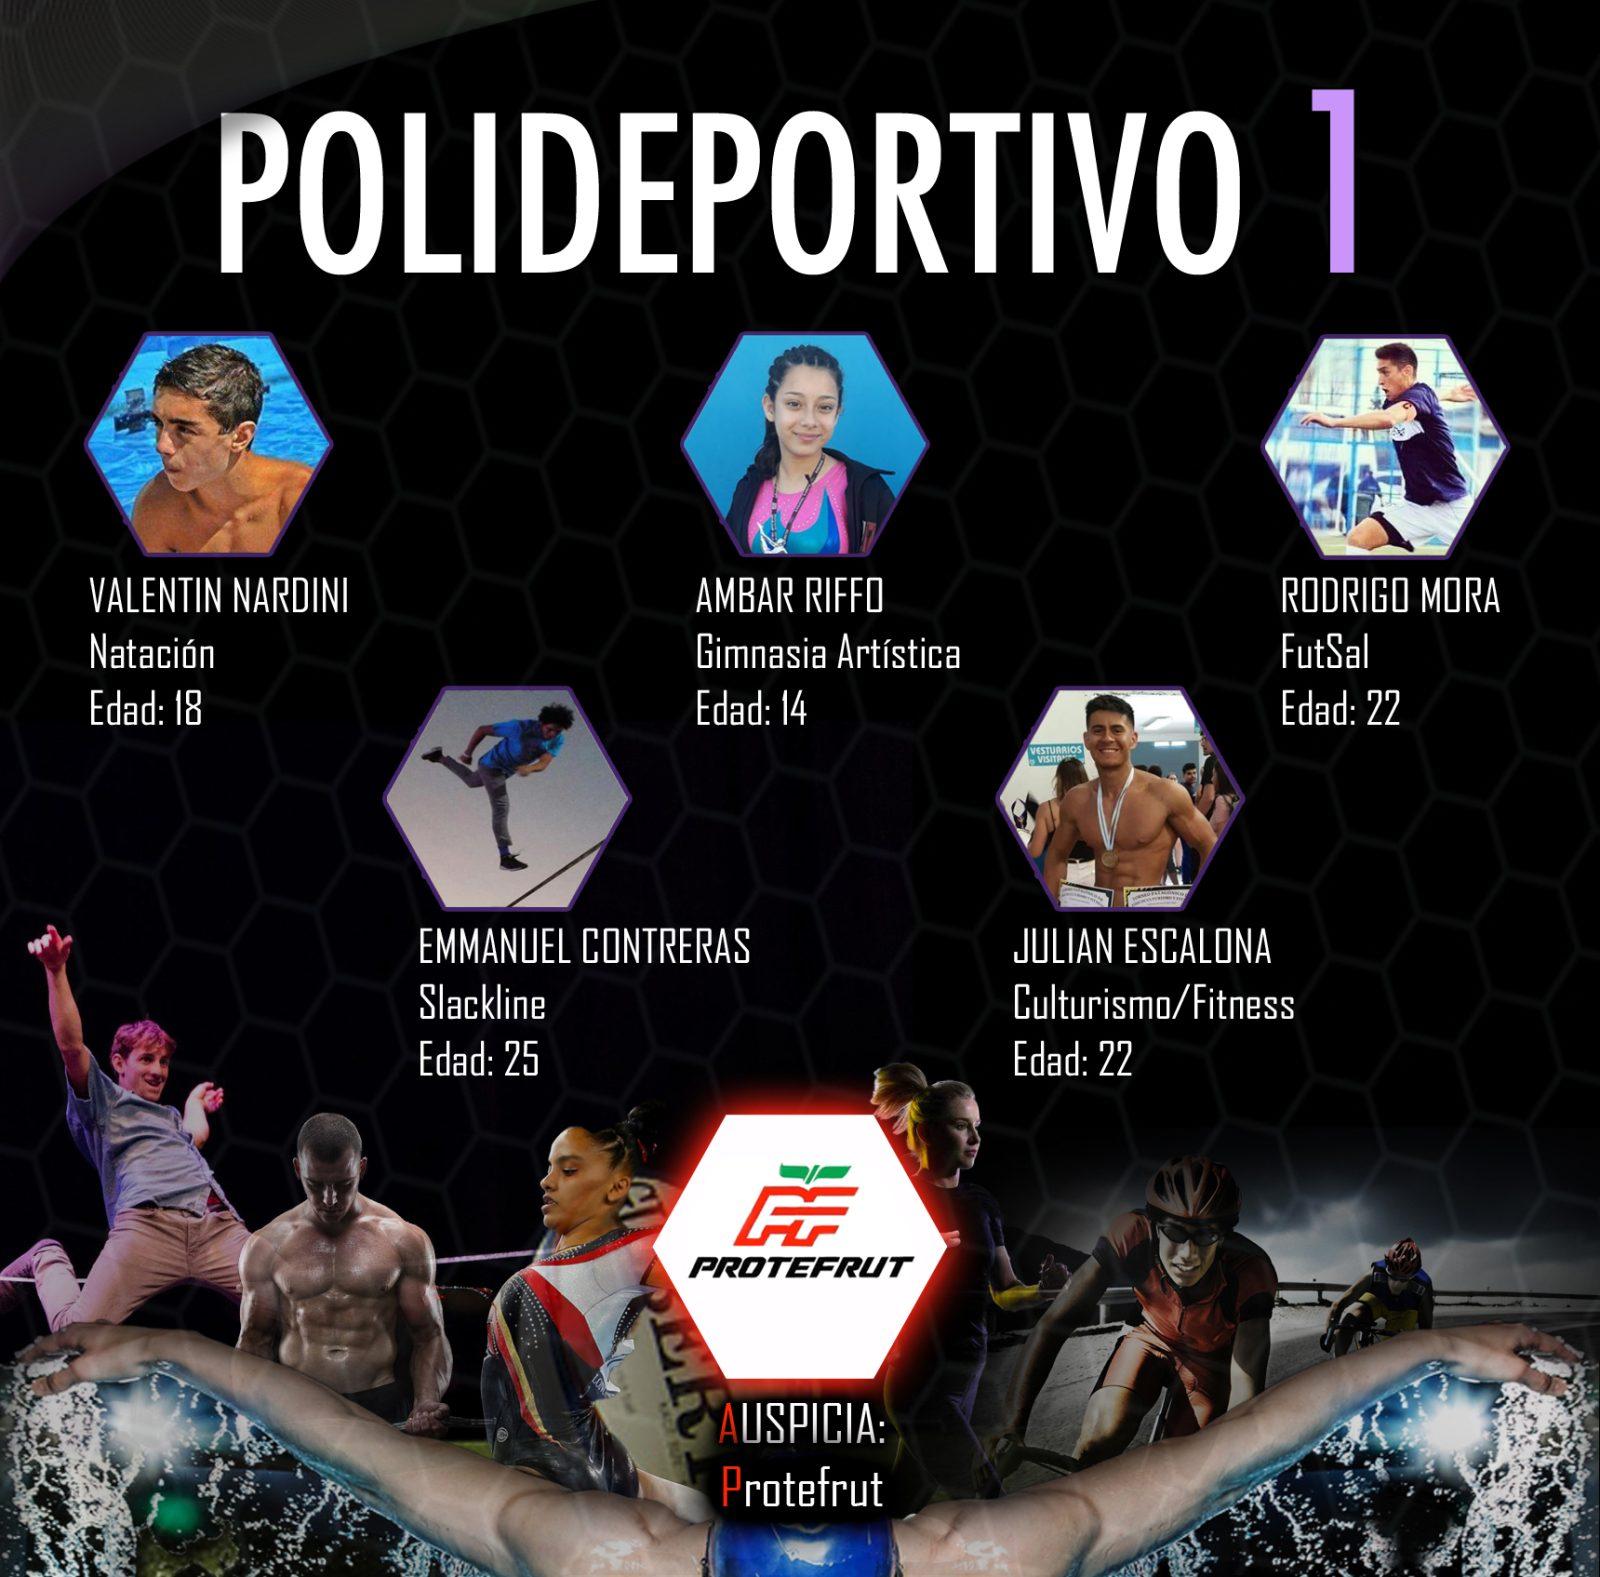 PREMIOS DIGITALES DEPORTIVOS E-TAPAS 2019/POLIDEPORTIVO#1